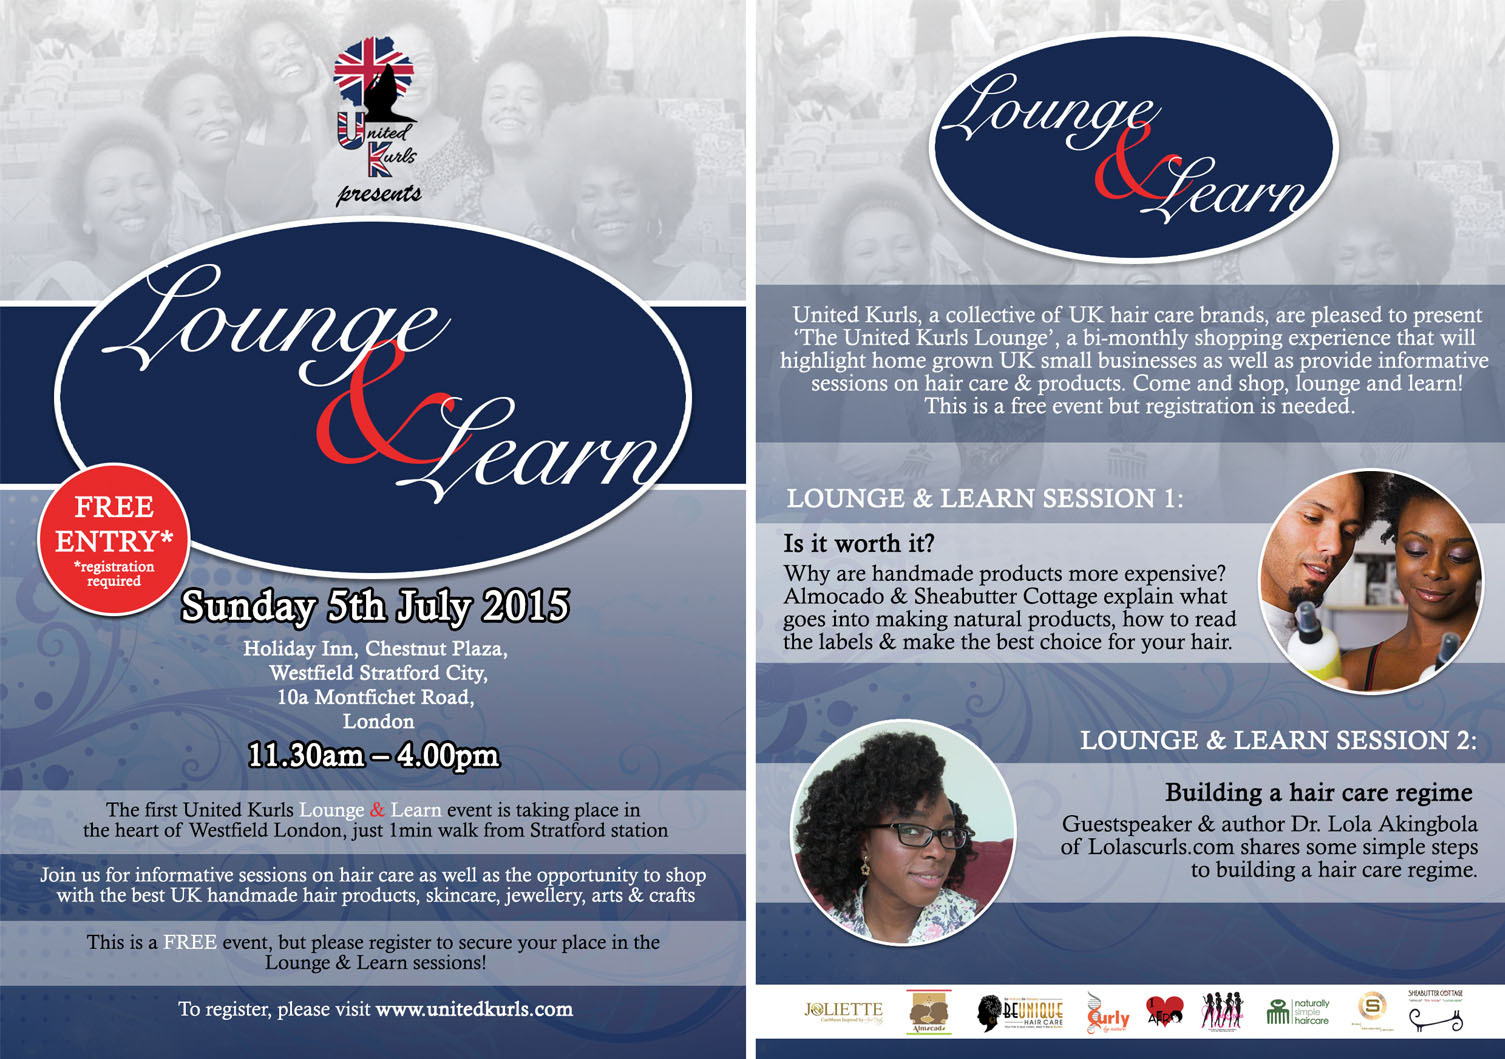 United Kurls: Lounge & Learn